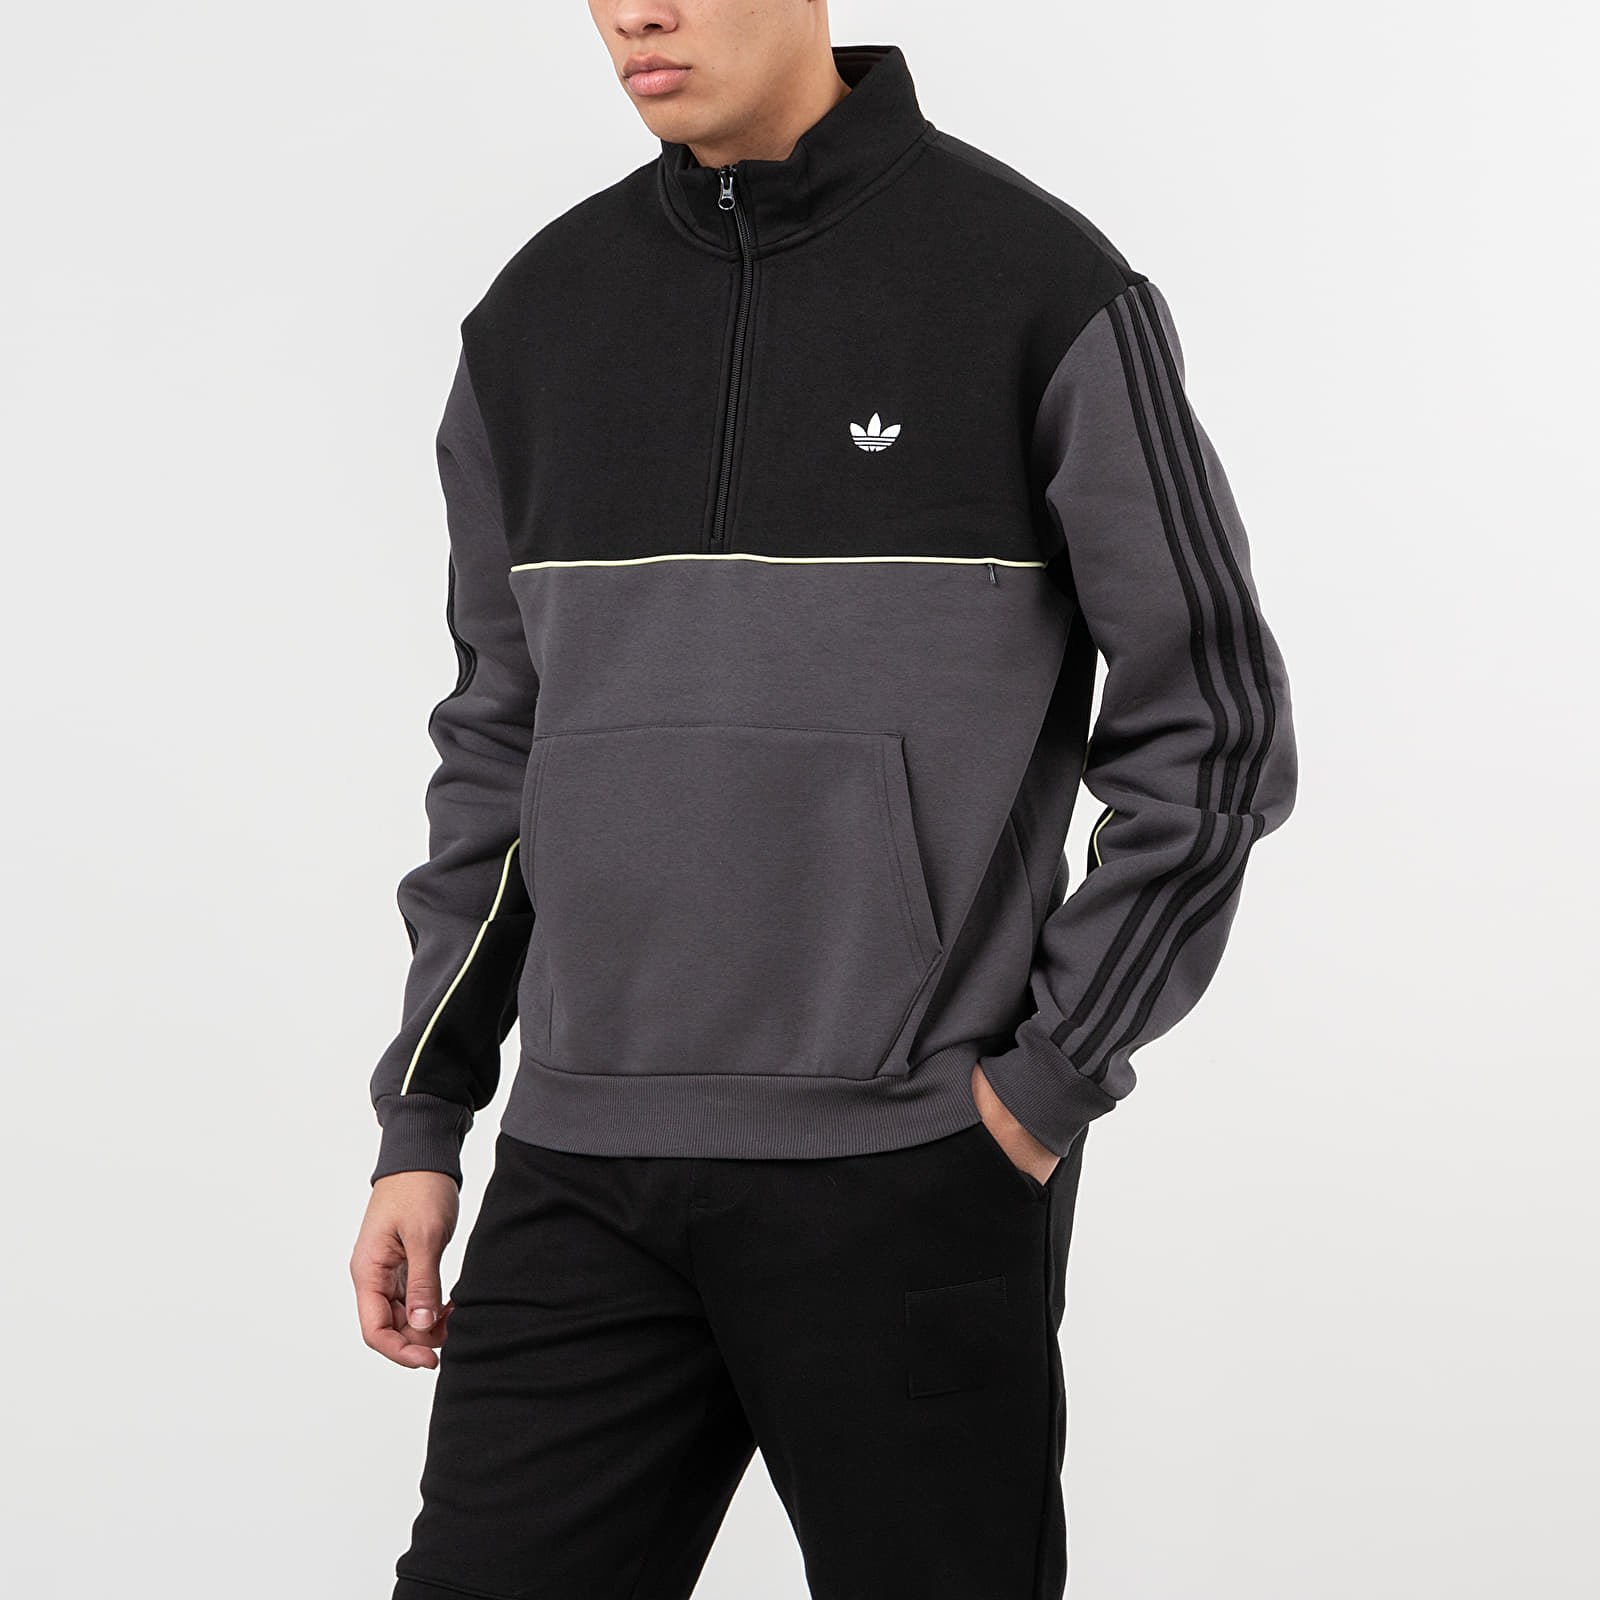 Sweatshirts adidas Mod Sweatshirt Black/ DGH Solid Grey/ Yellow Tint